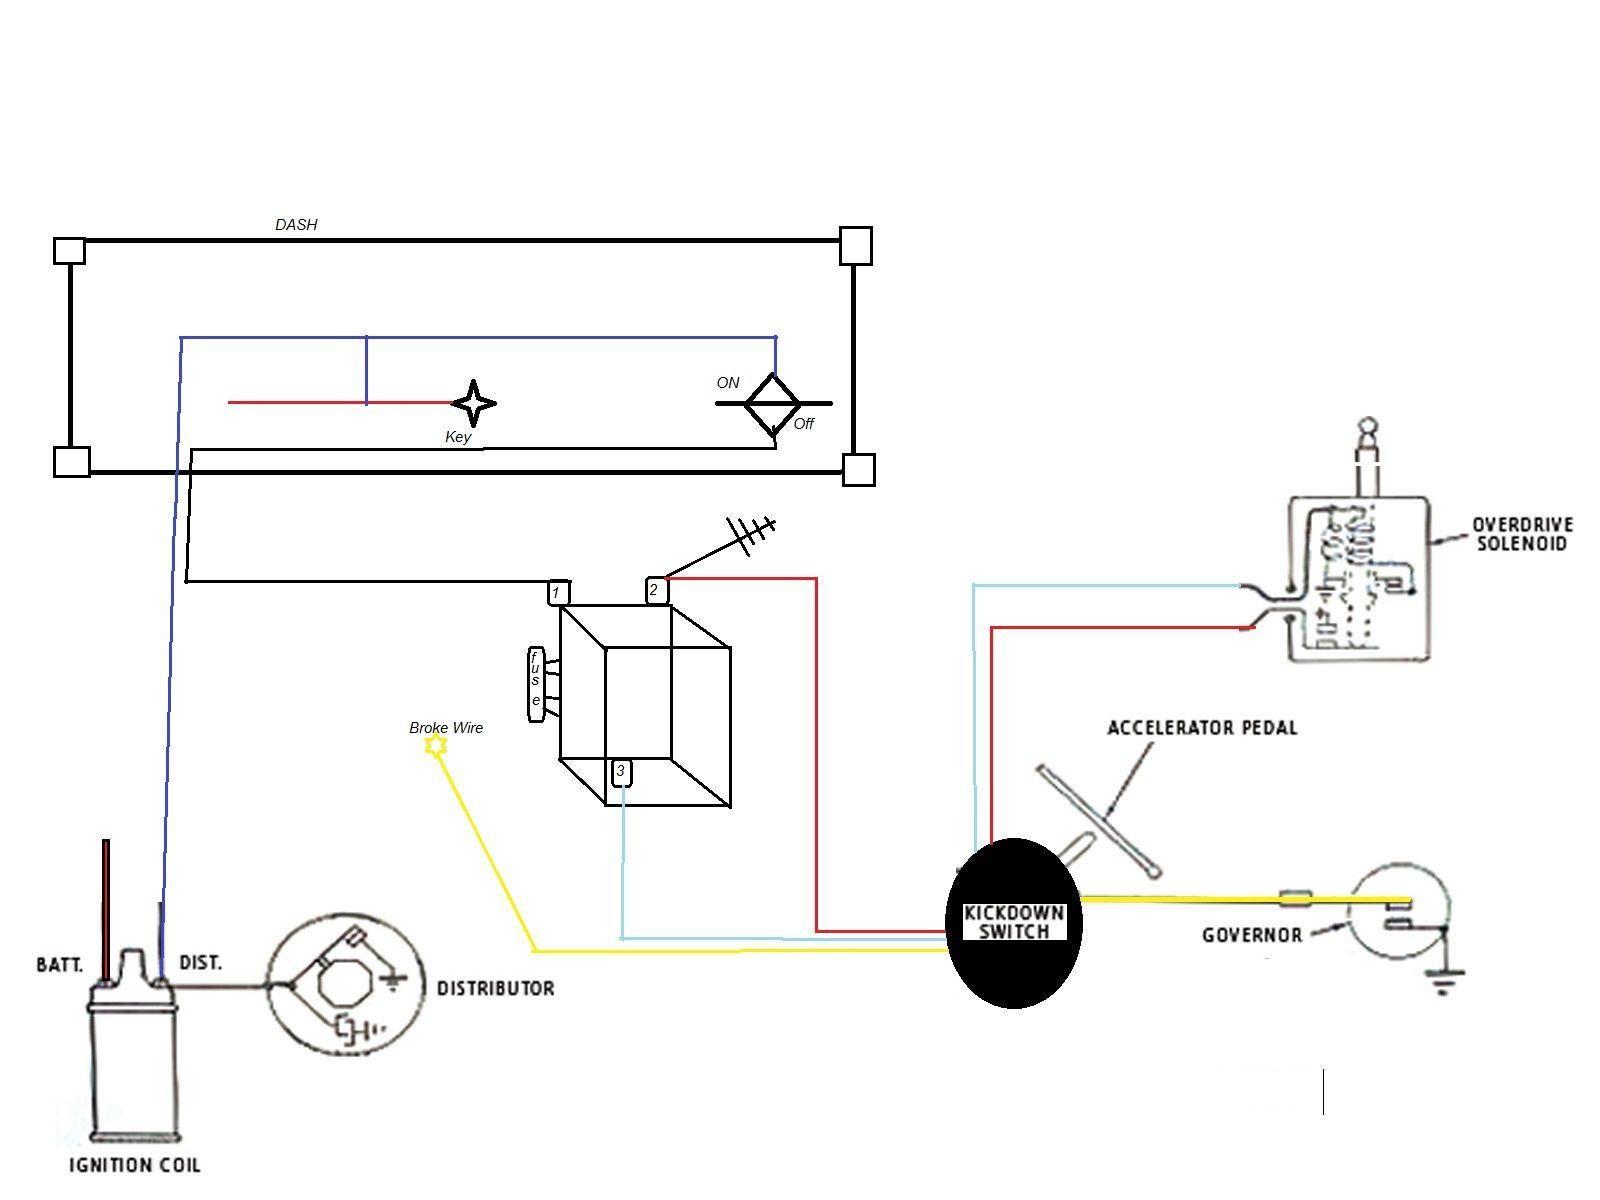 Single Wire Alternator Wiring Diagram Audi A4 Alternator Wiring Diagram Fresh Bw Od Troubleshooting 55 Of Single Wire Alternator Wiring Diagram